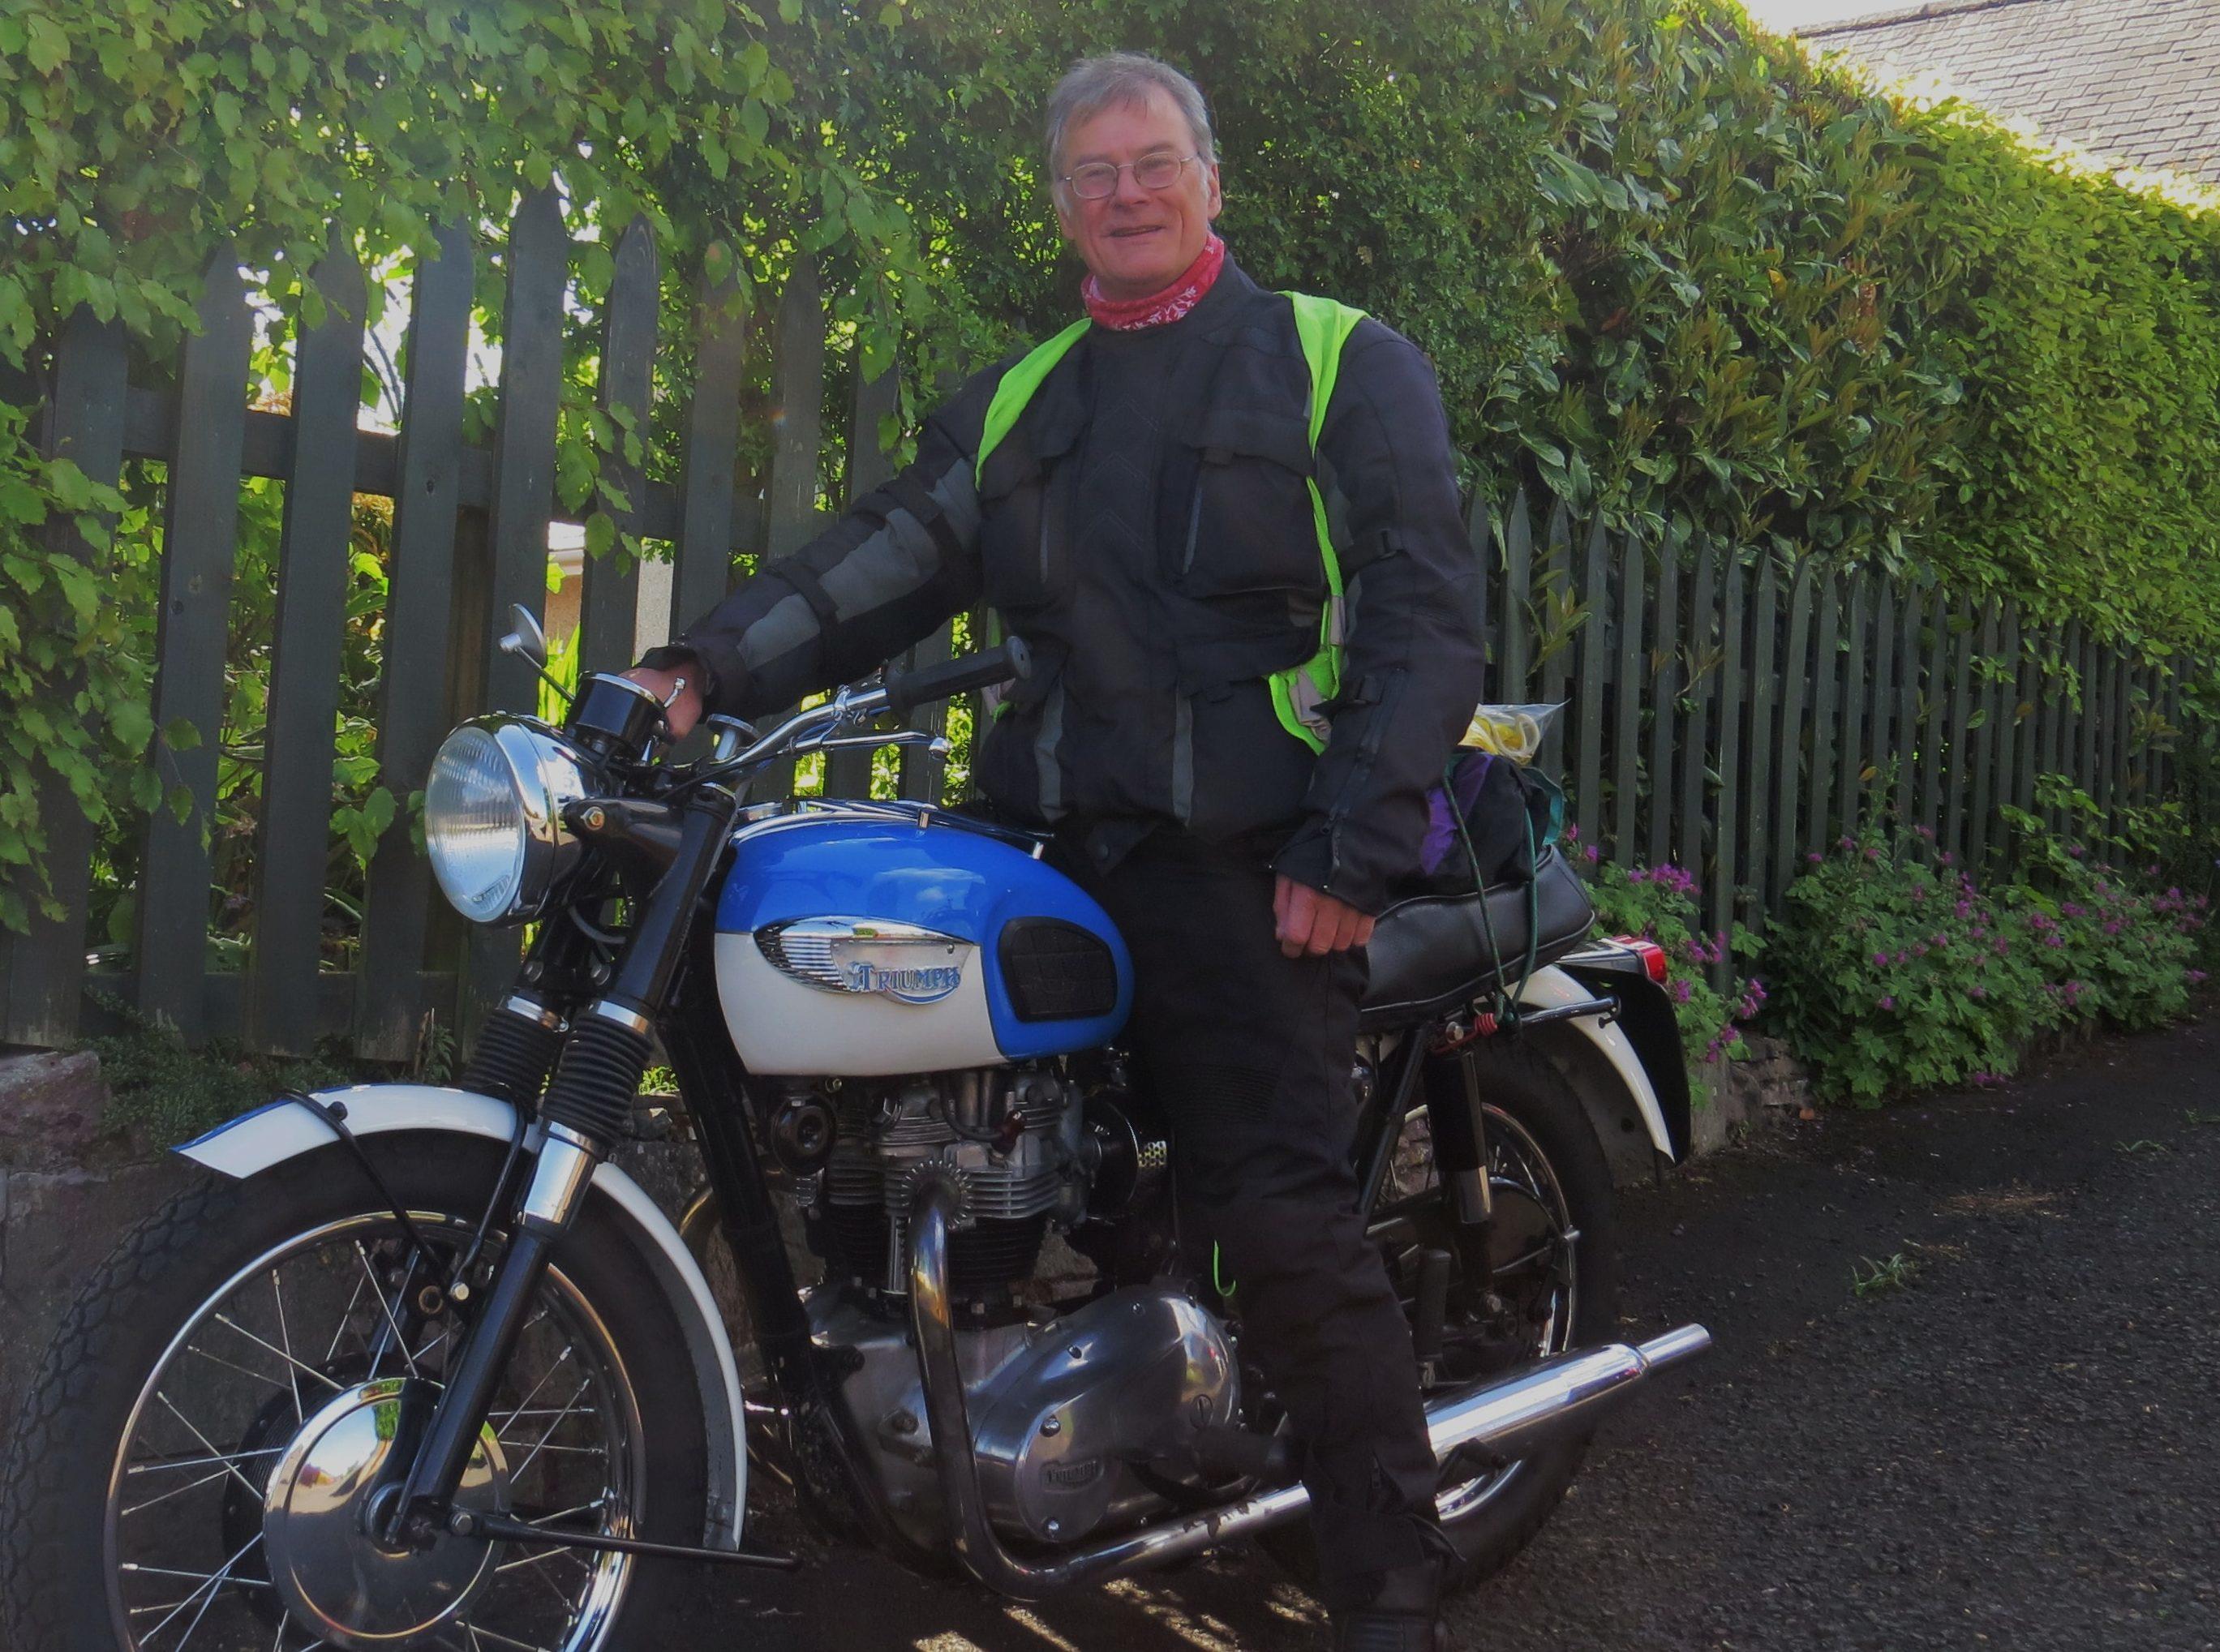 Rod Richardson with his 1966 Triumph bike.